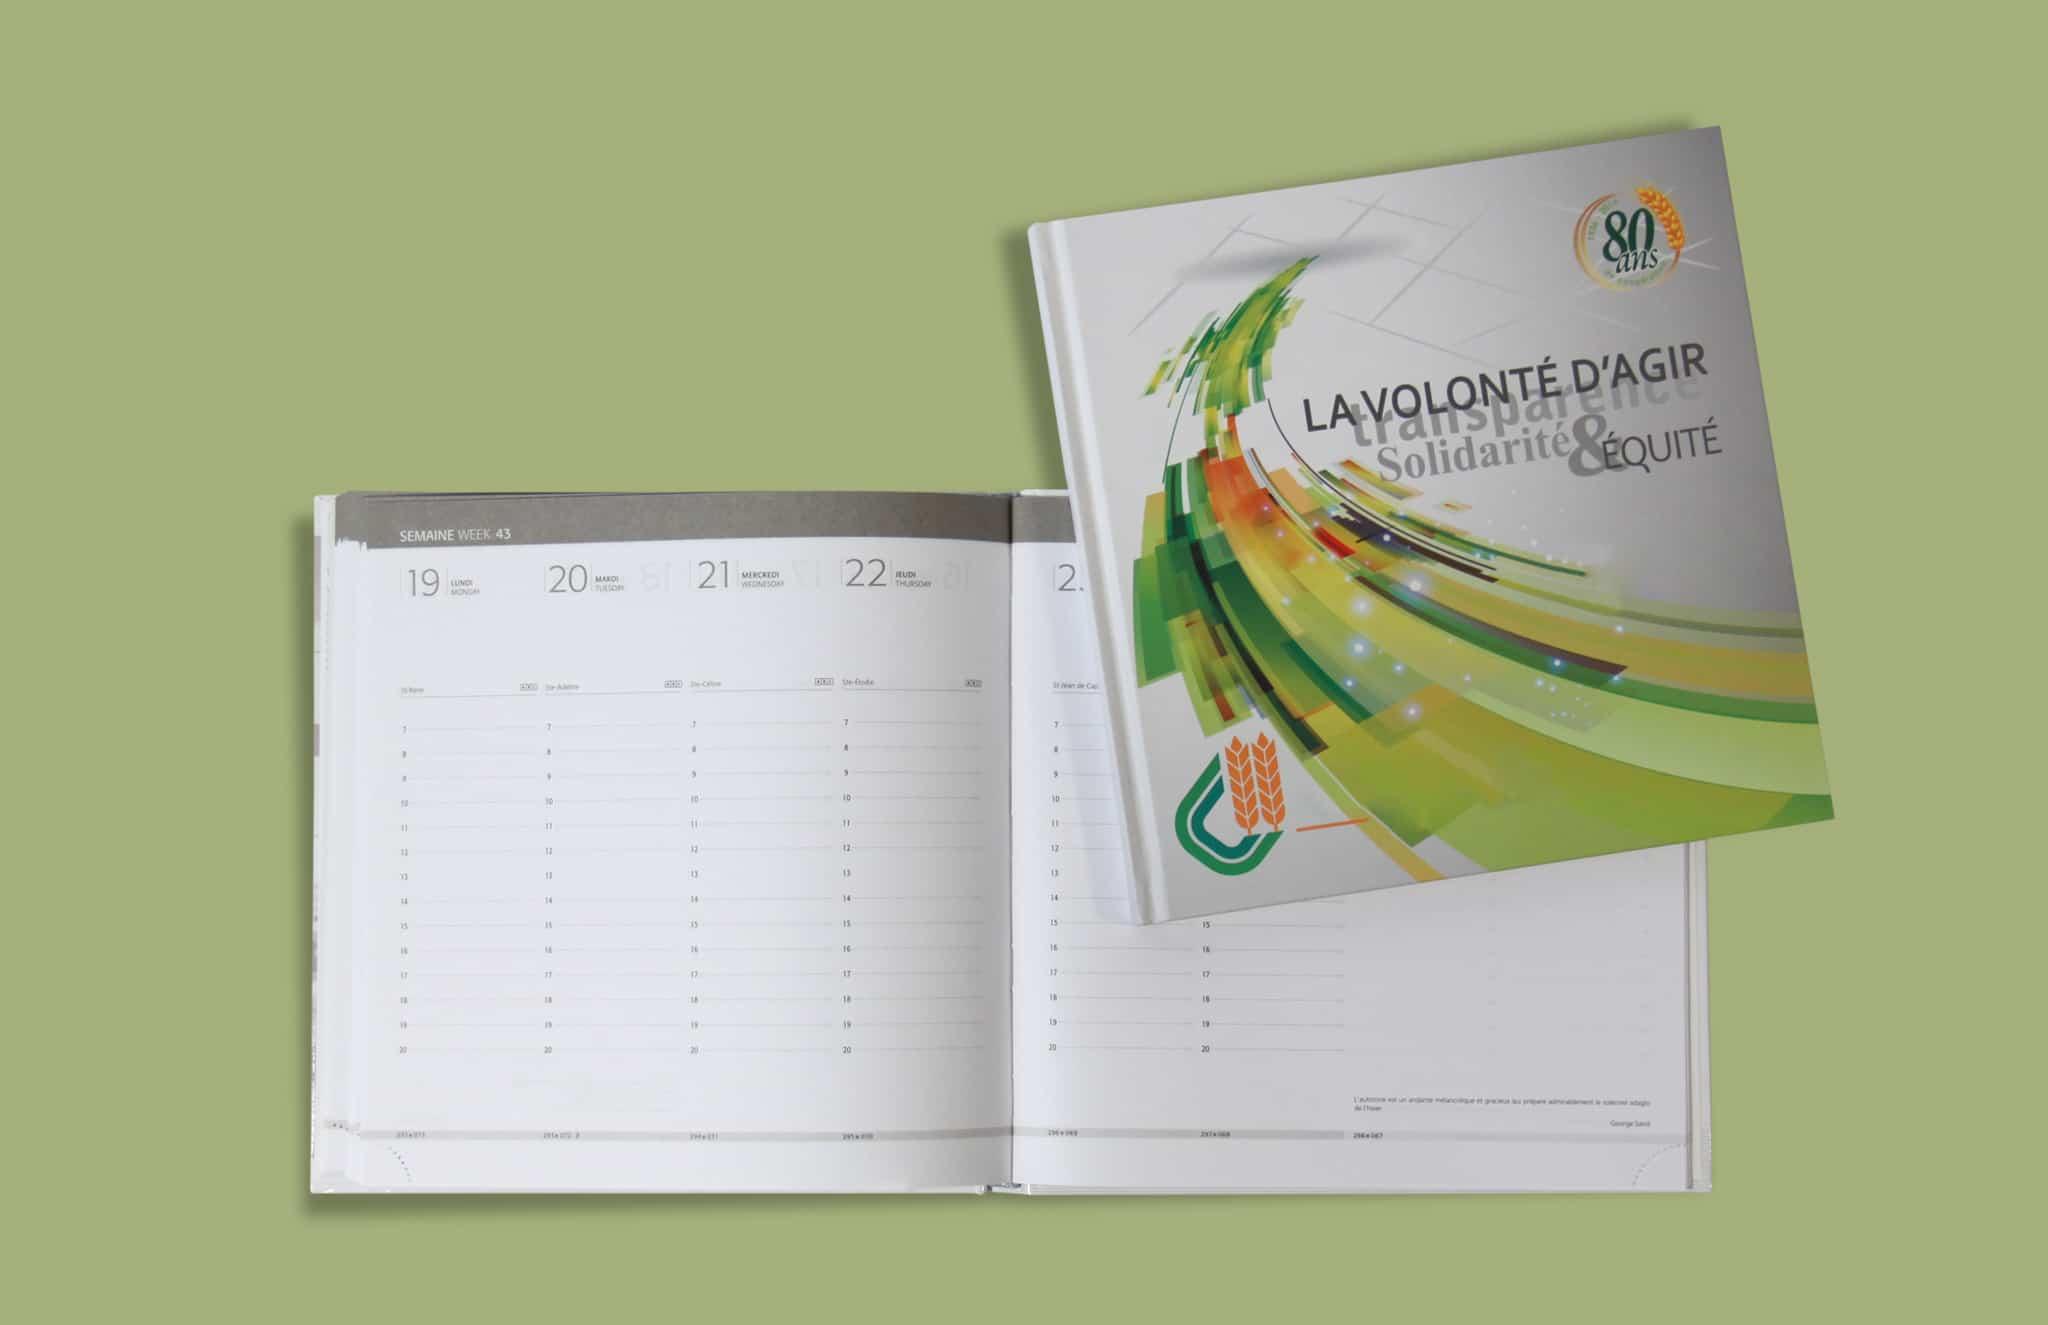 Agenda Bureau V20 Couverture Imprimee Reliure Emboitee